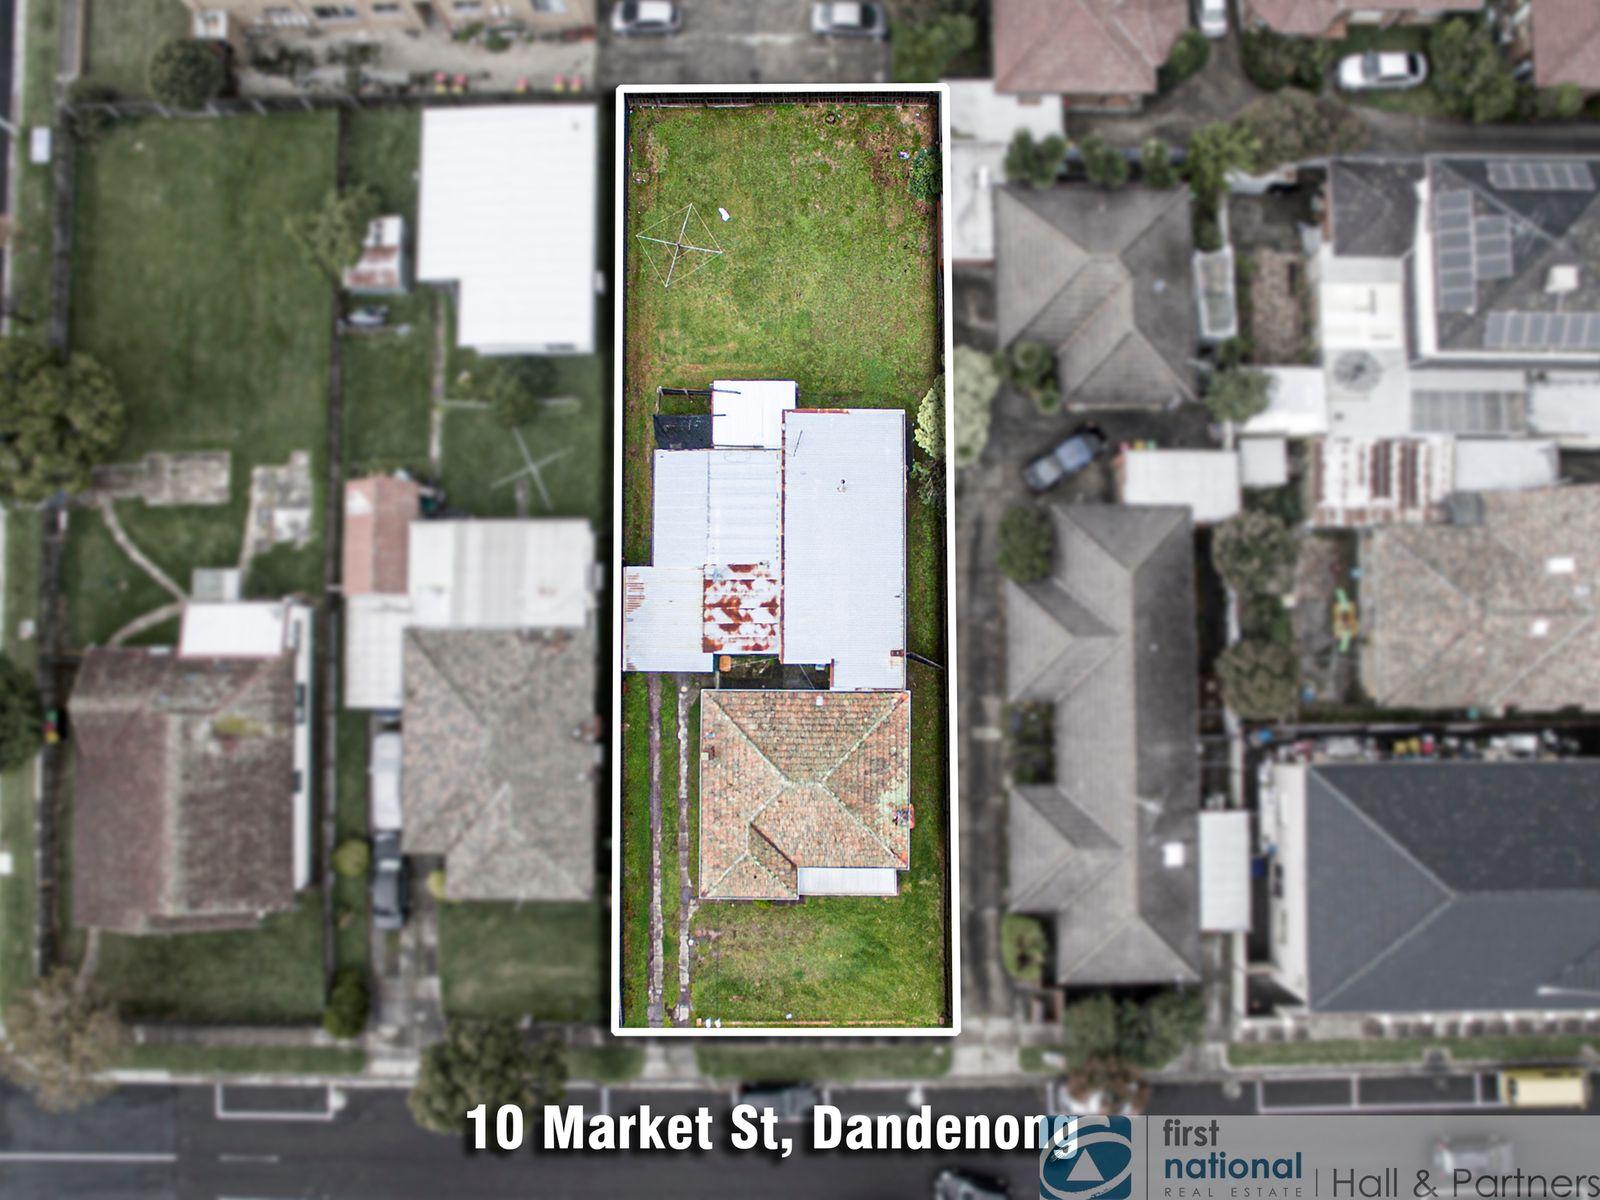 10 Market Street, Dandenong, VIC 3175